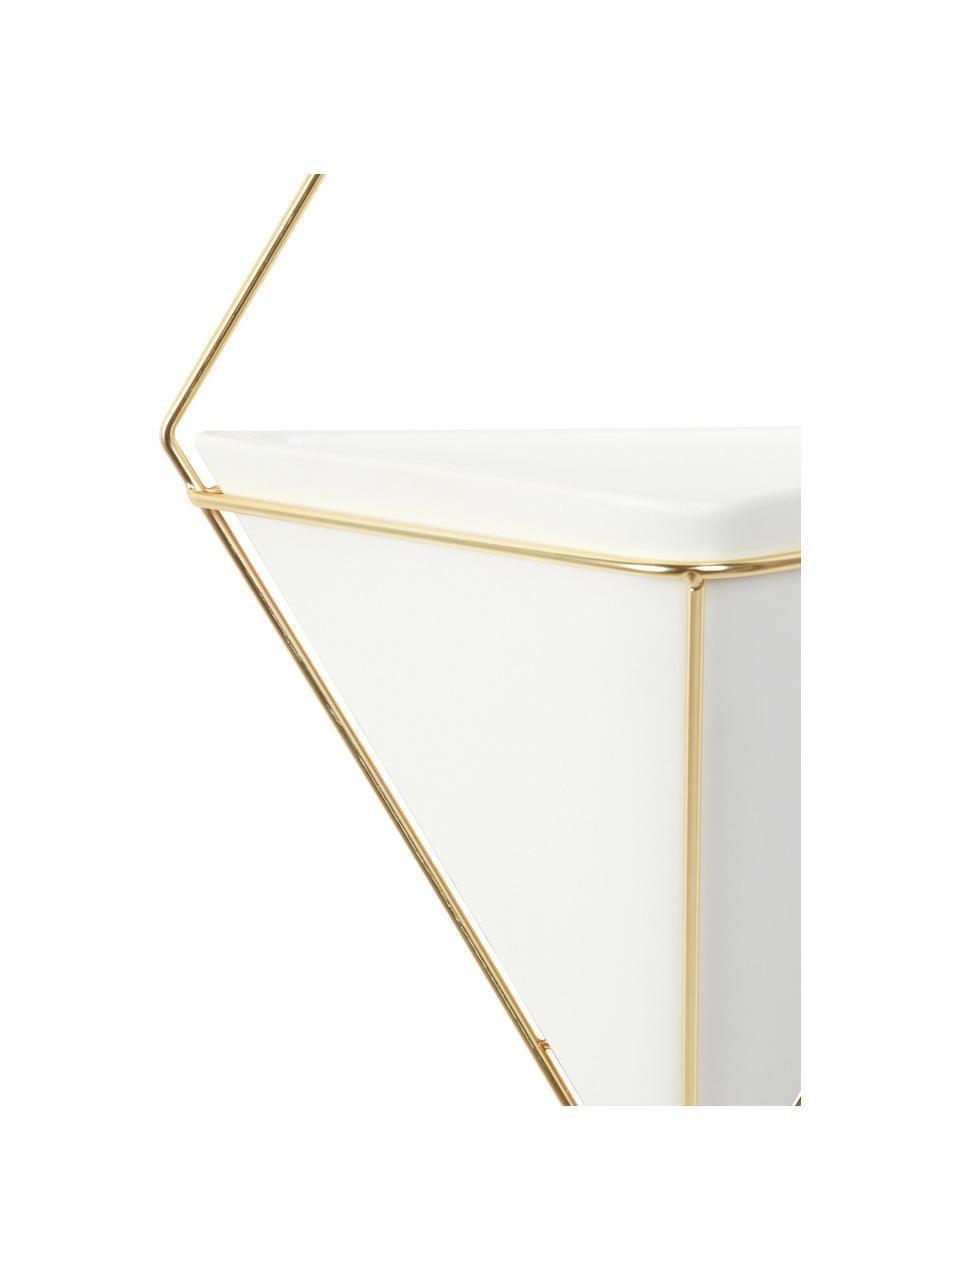 Wandaufbewahrungs-Schale Trigg aus Keramik, Aufbewahrung: Keramik, Weiß, Messing, matt, 23 x 38 cm